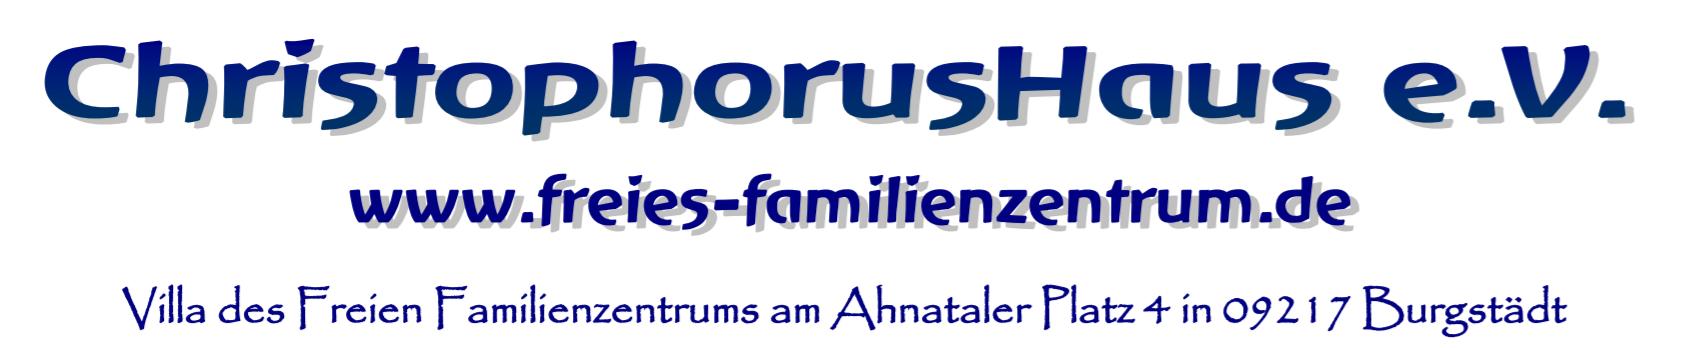 Christopherus-Haus Burgstädt